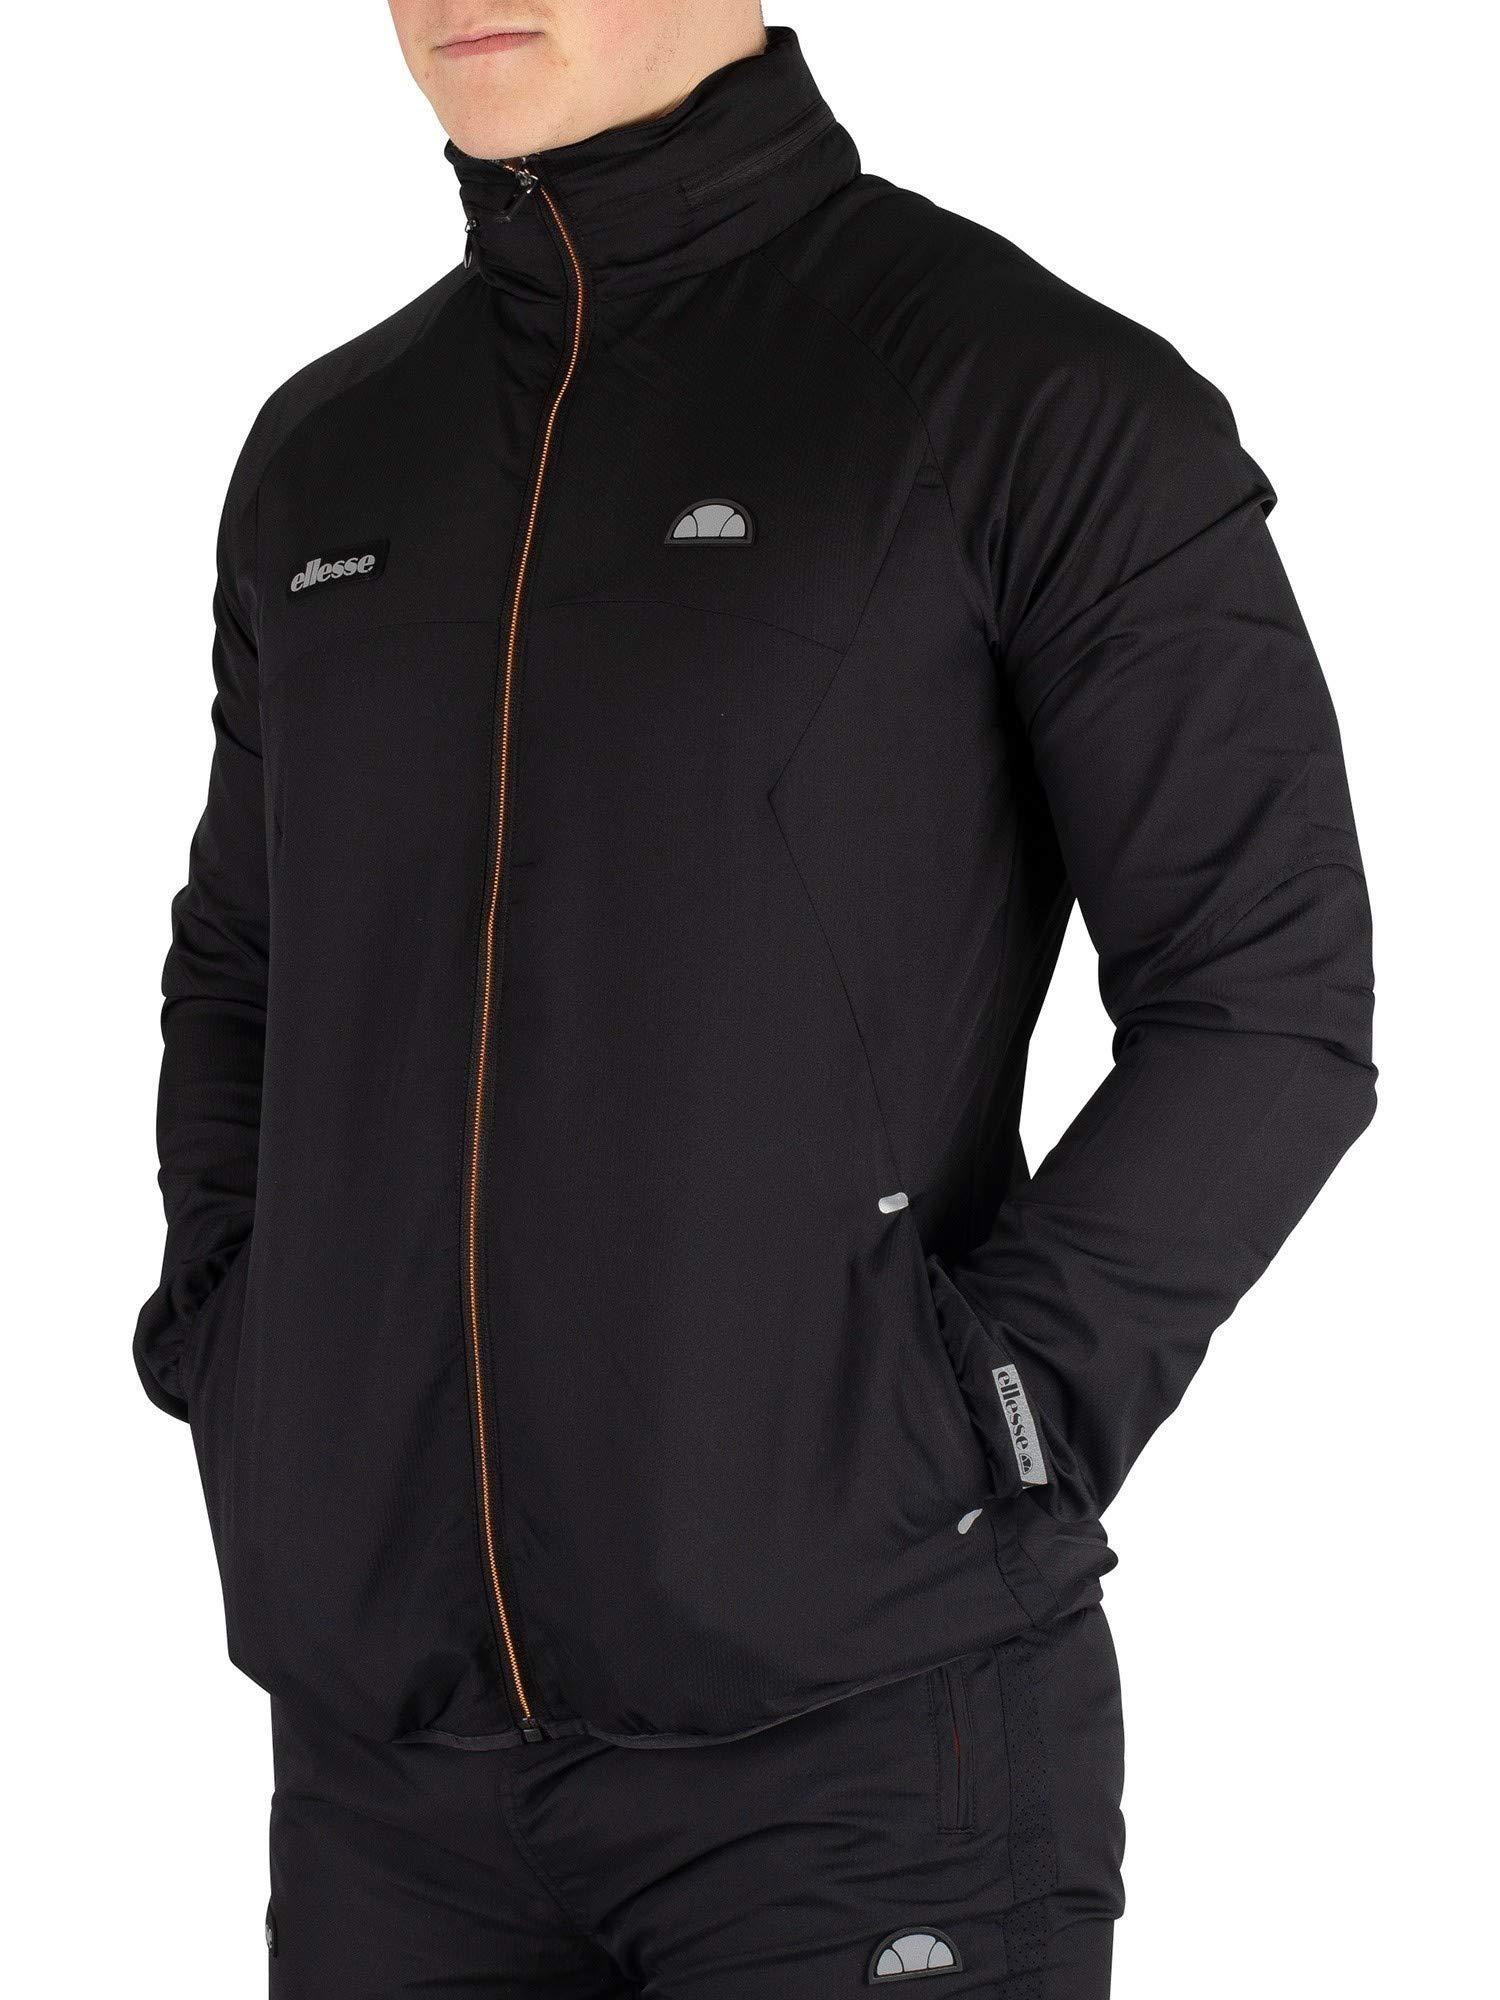 ellesse Men's Calabrian Poly Ripstop Jacket, Black